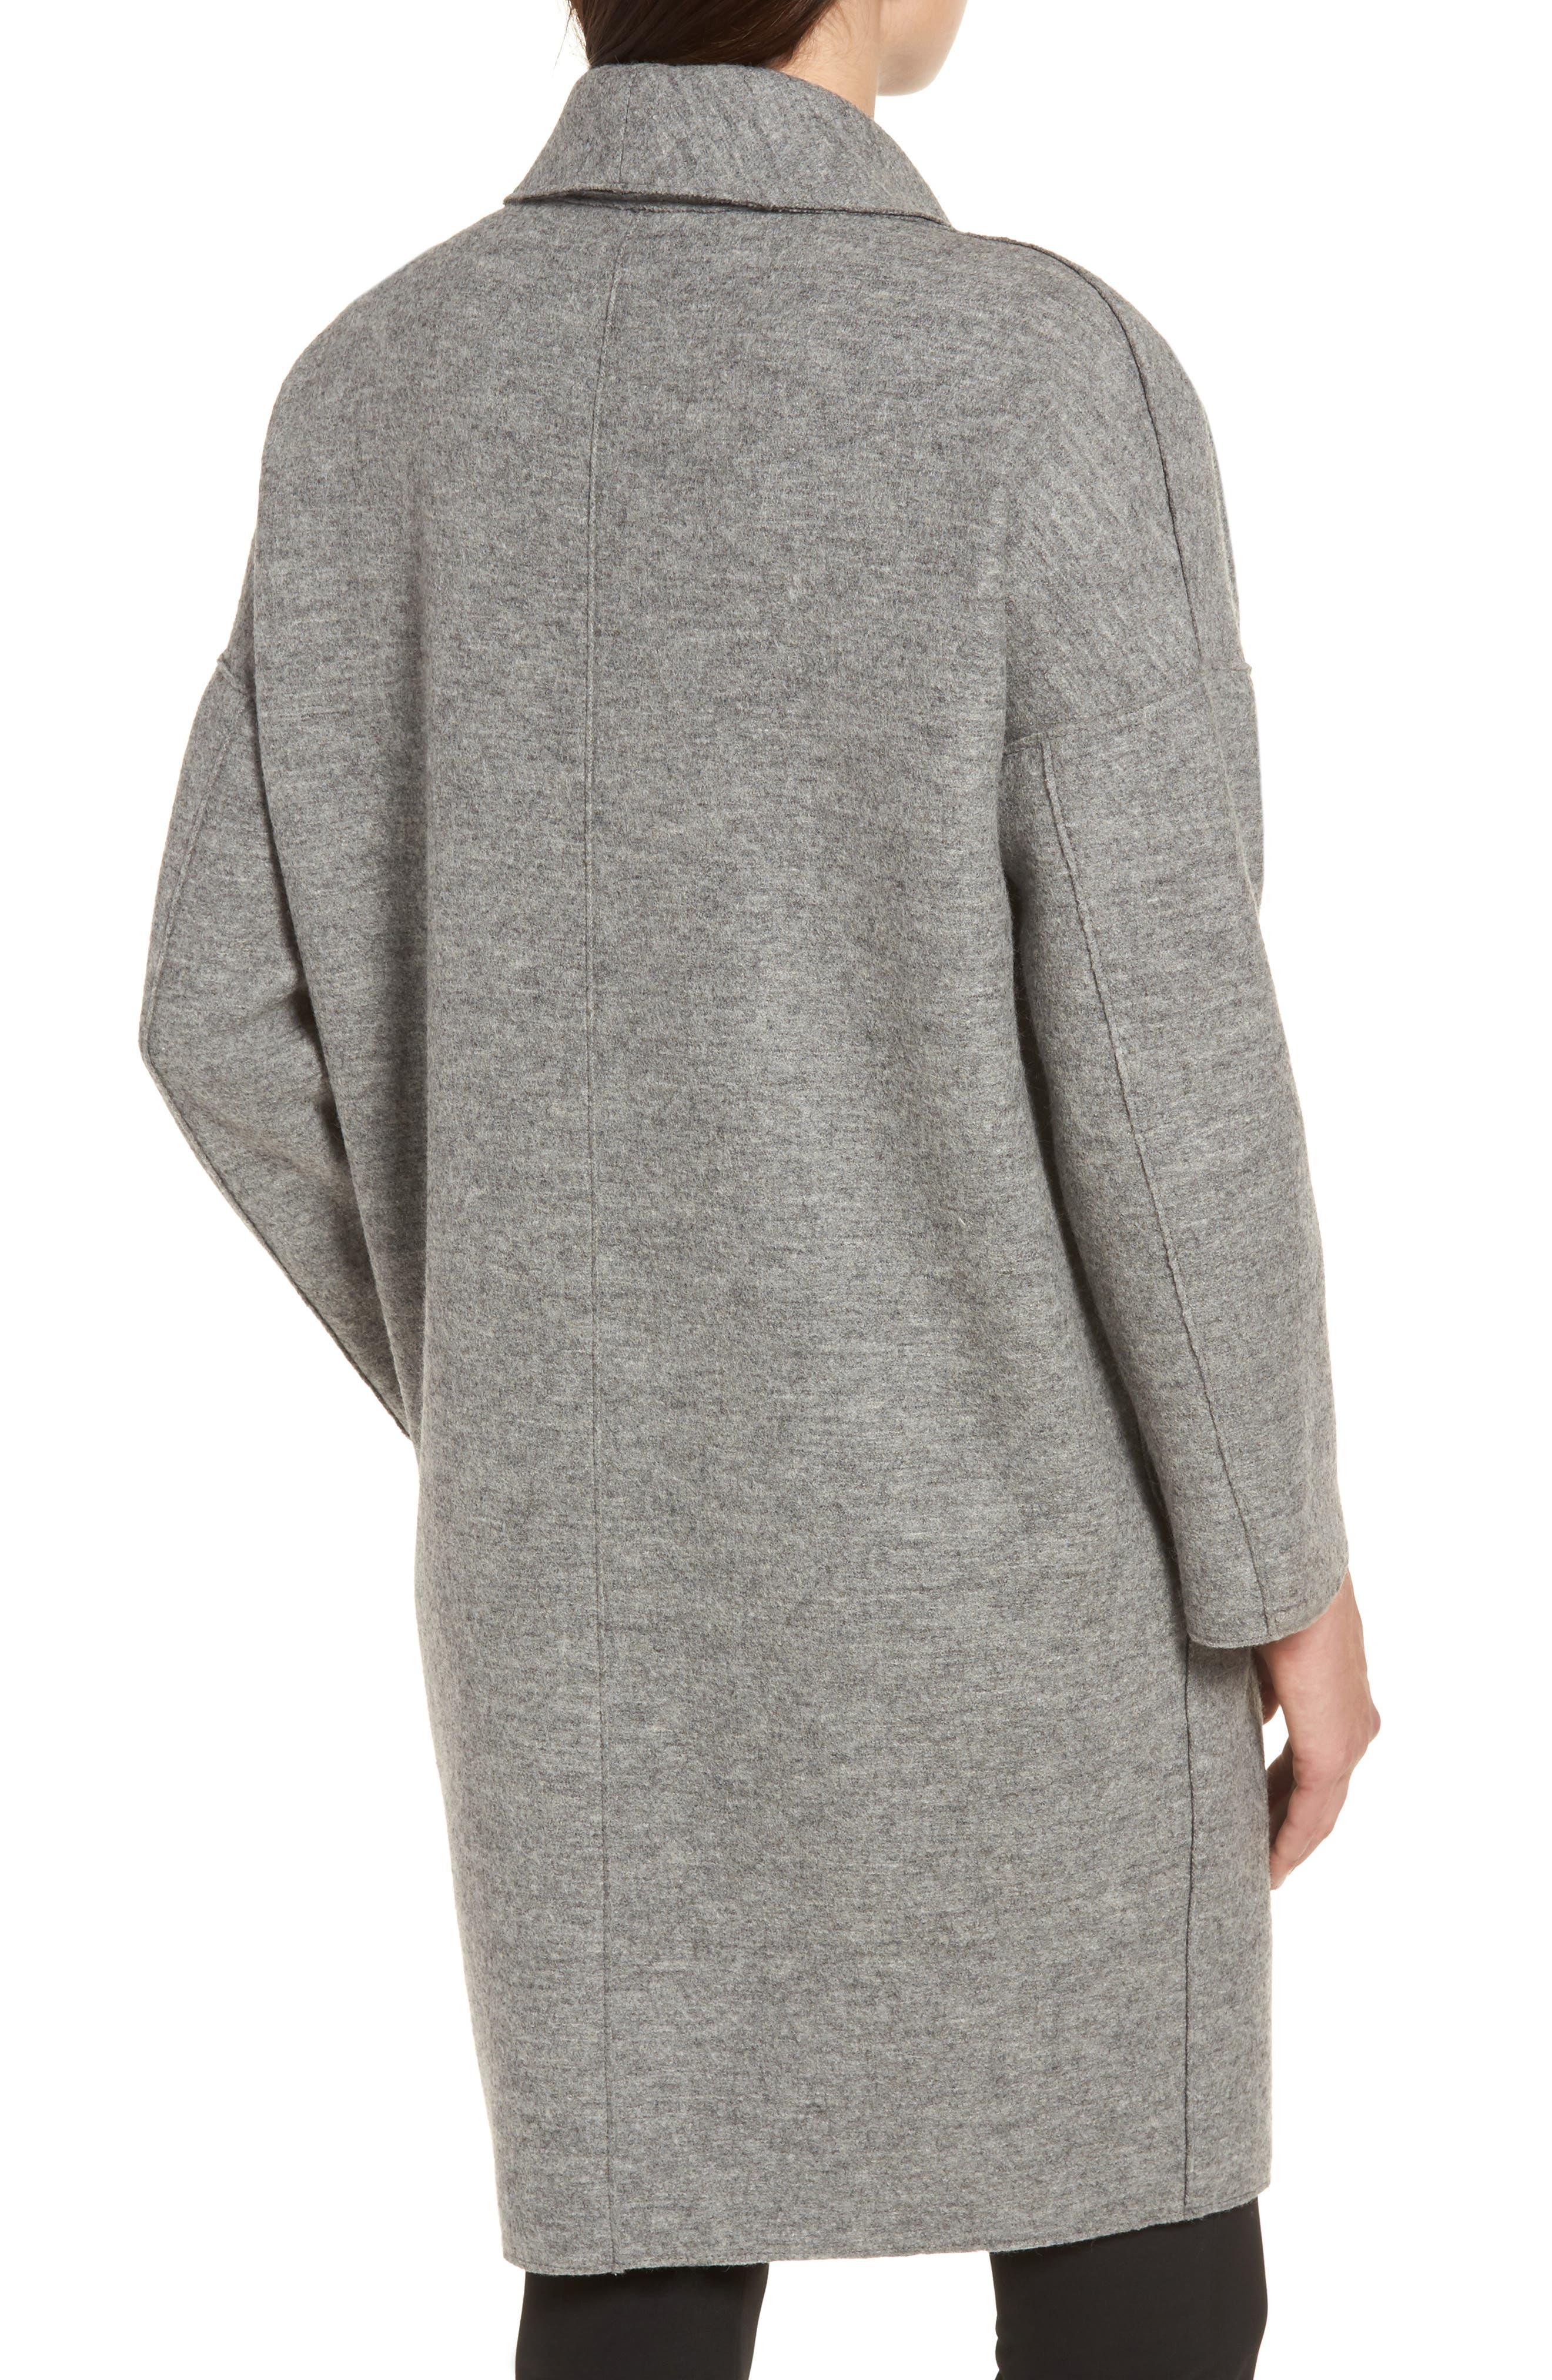 Emma Boiled Wool Coat,                             Alternate thumbnail 2, color,                             020